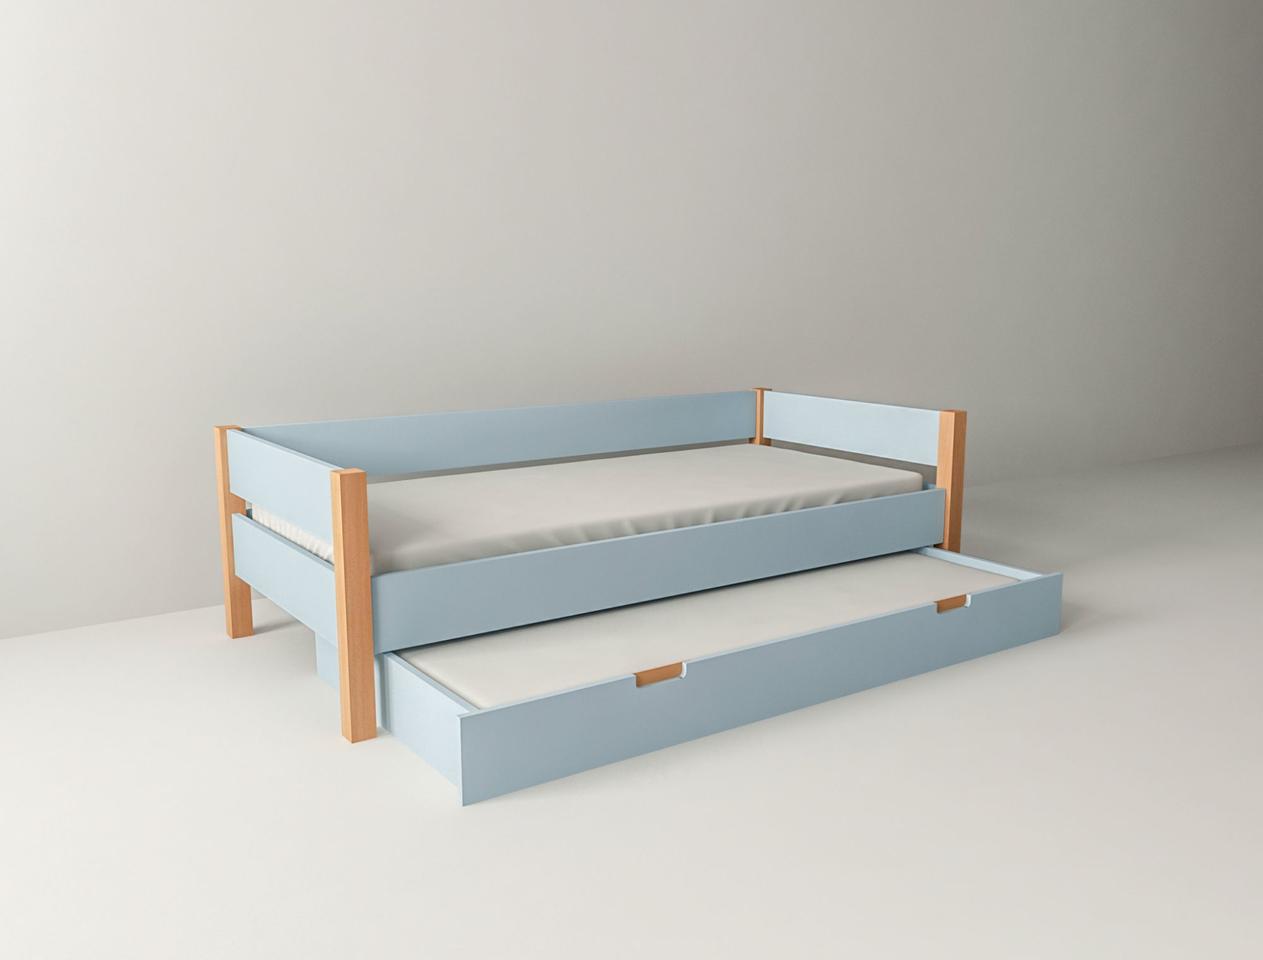 Kinderbett Jugenbett Colorland mit ausziehbarer Gästebett Schublade